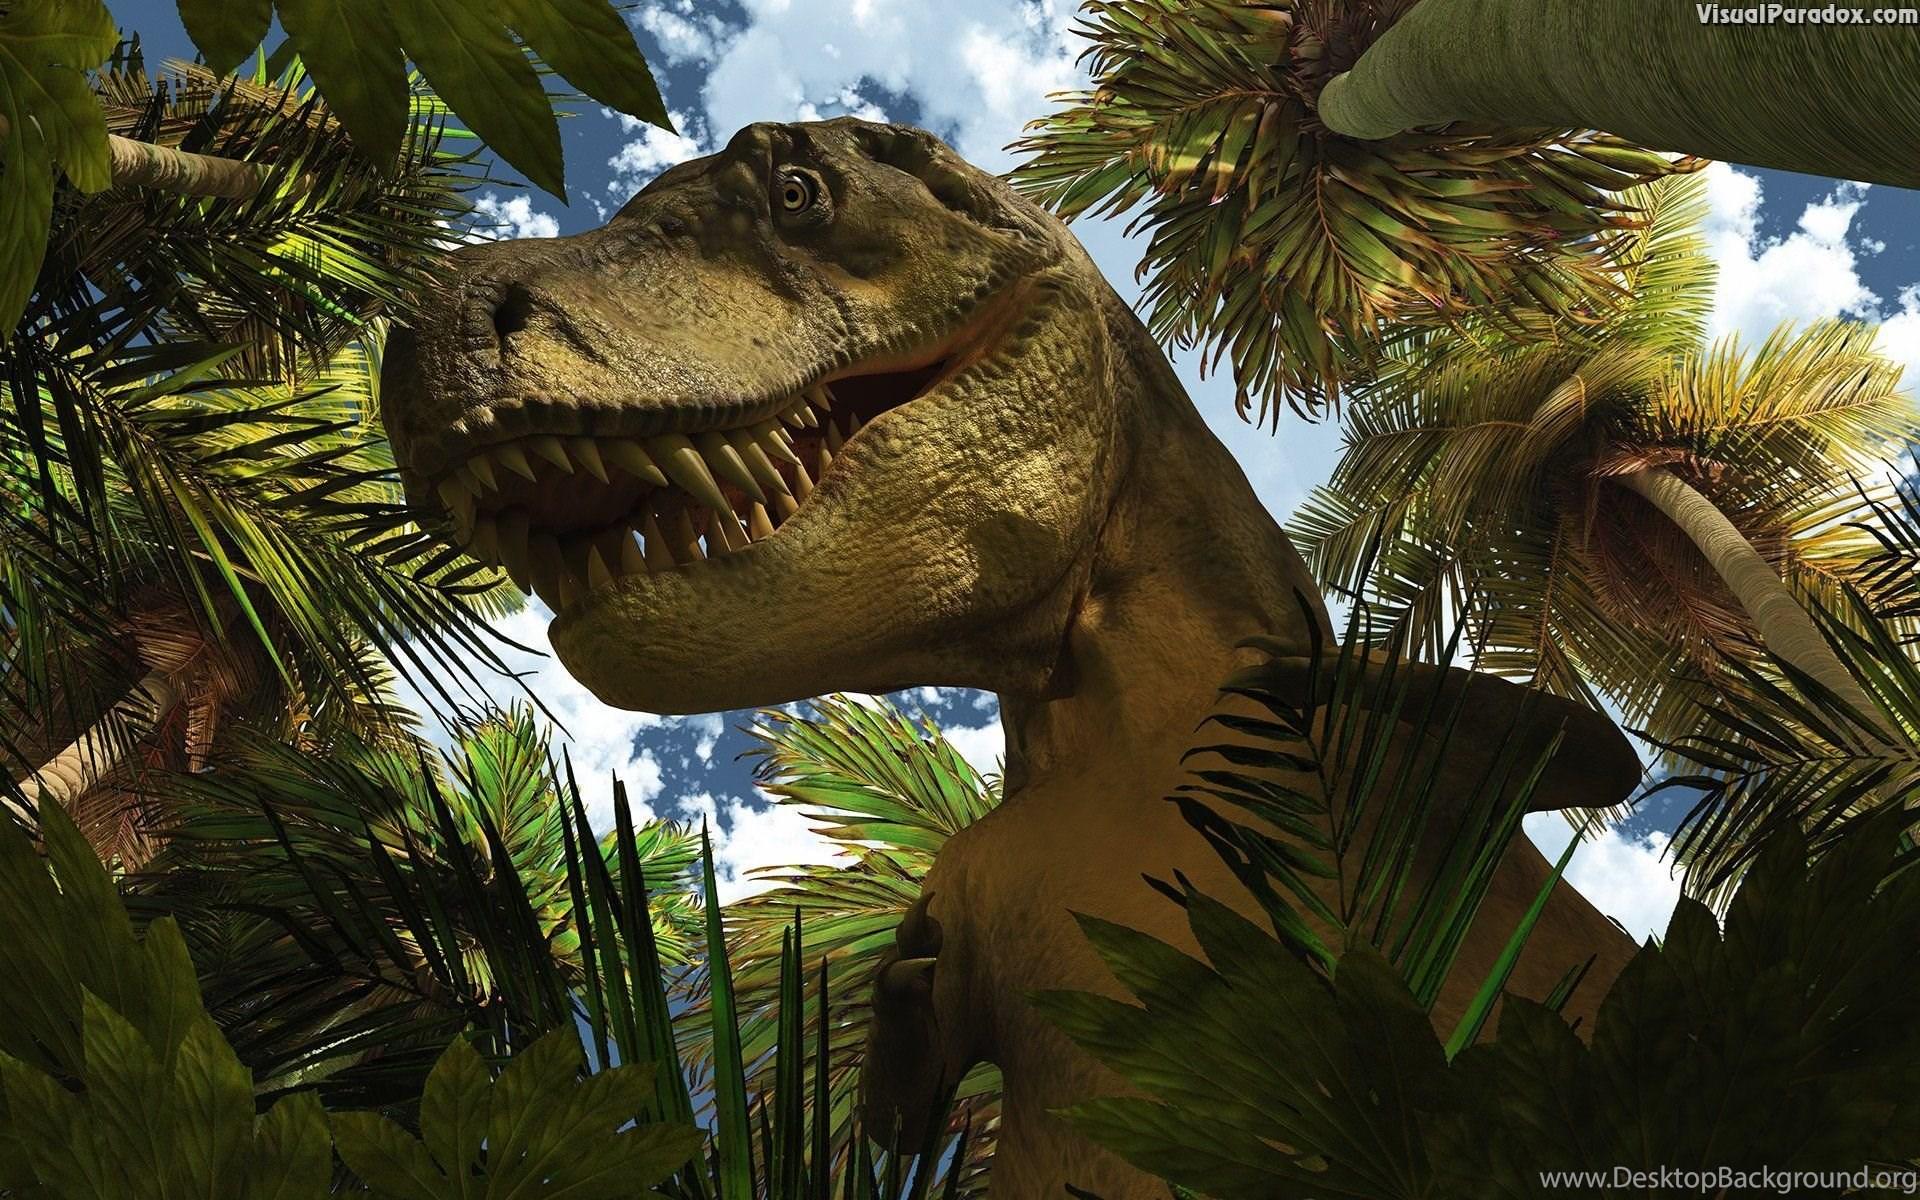 dinosaur hd wallpapers desktop background